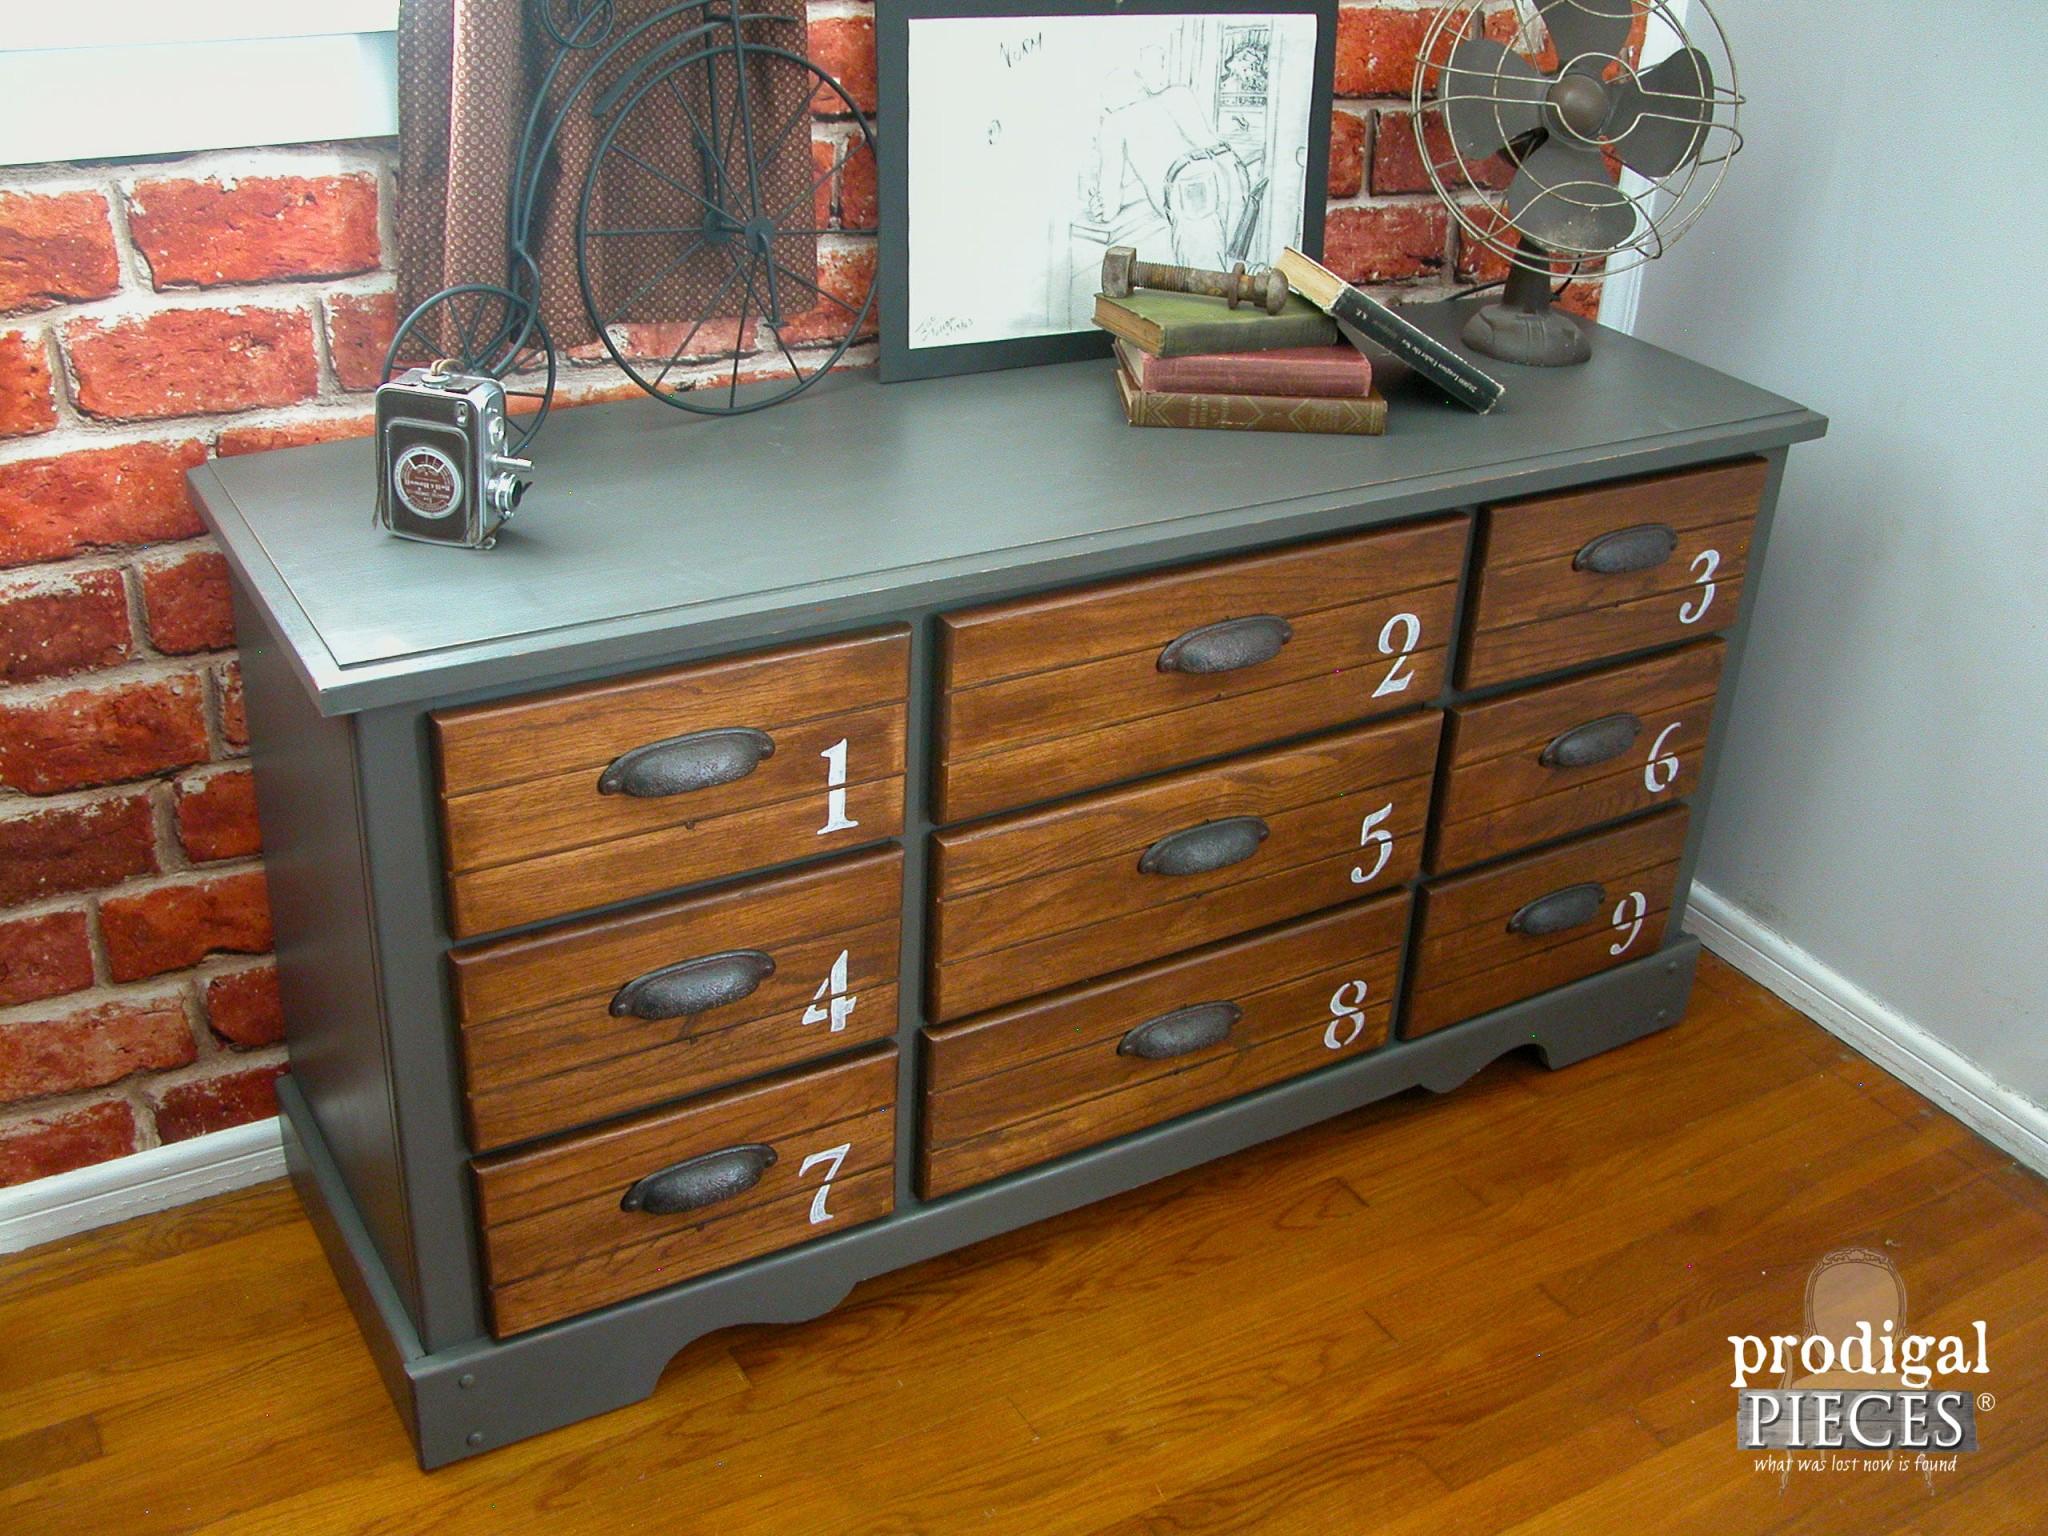 Vintage Dresser Features Industrial Vibe Prodigal Pieces